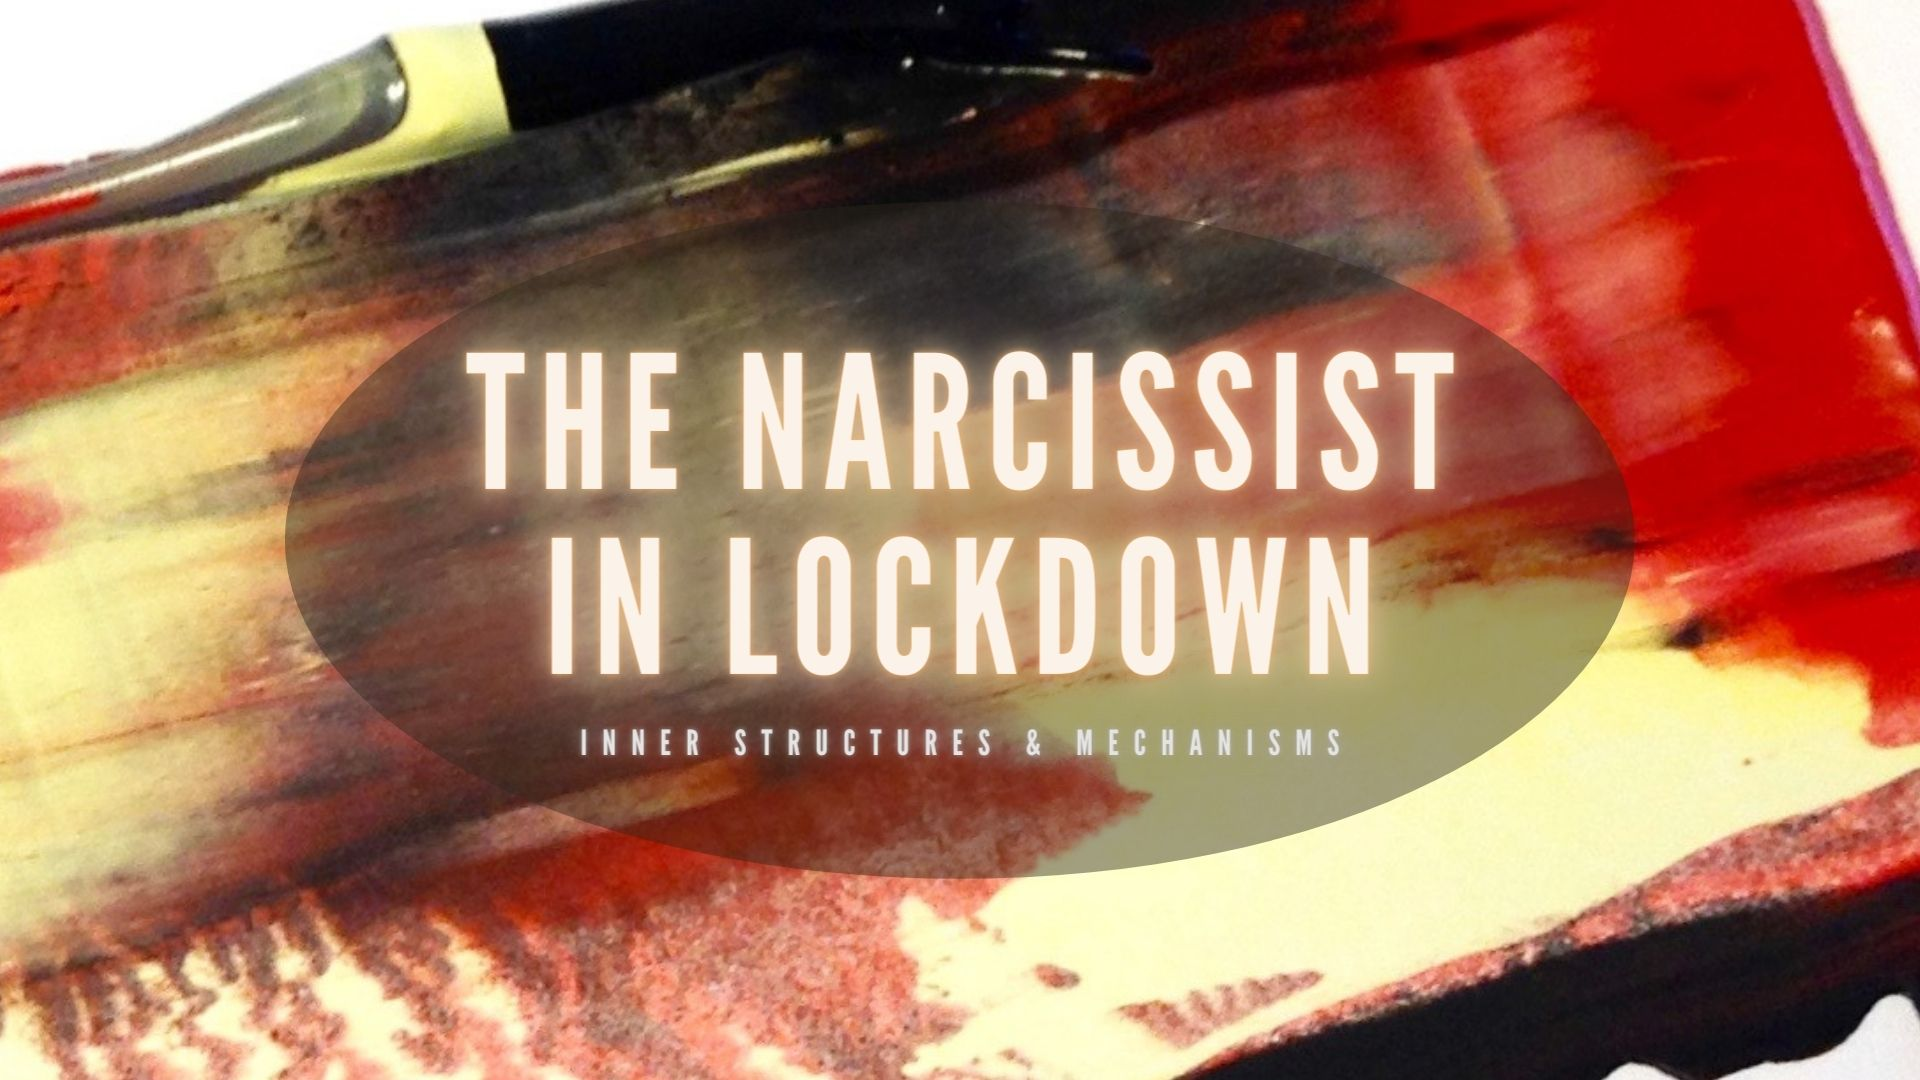 THE NARCISSIST IN LOCKDOWN